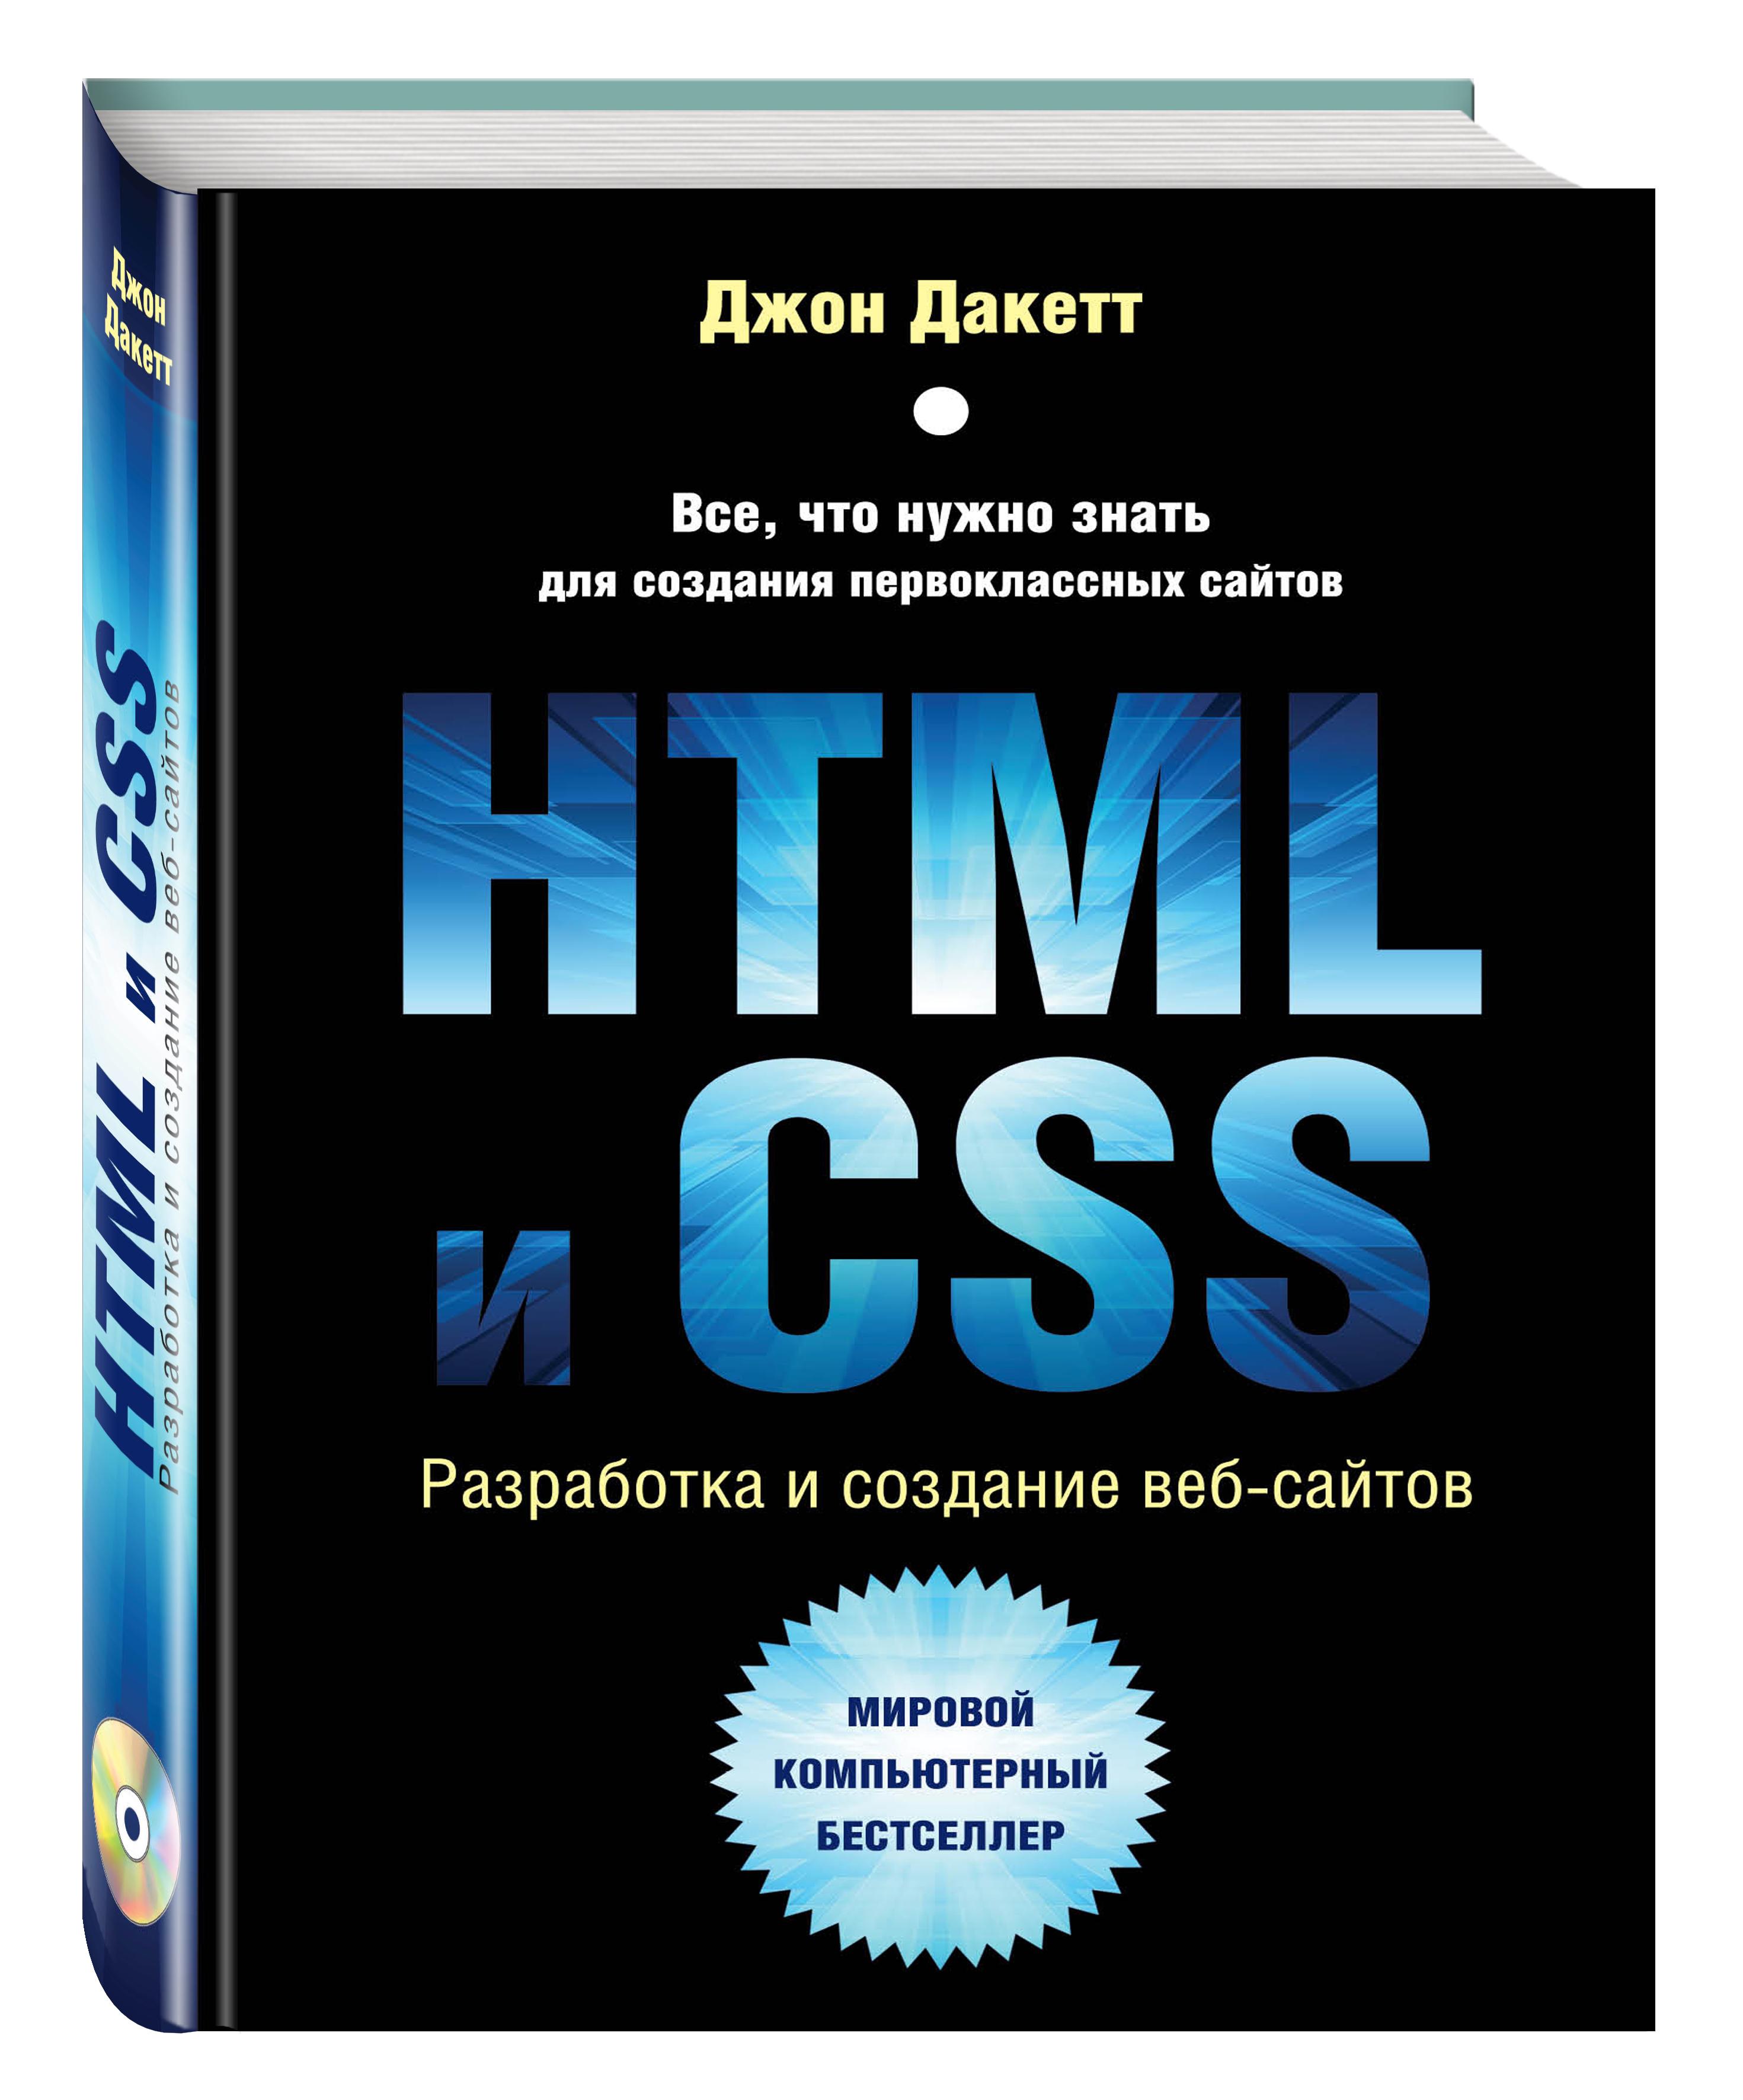 Джон Дакетт HTML и CSS. Разработка и дизайн веб-сайтов (+CD) дакетт дж html и css разработка и создание веб сайтов cd